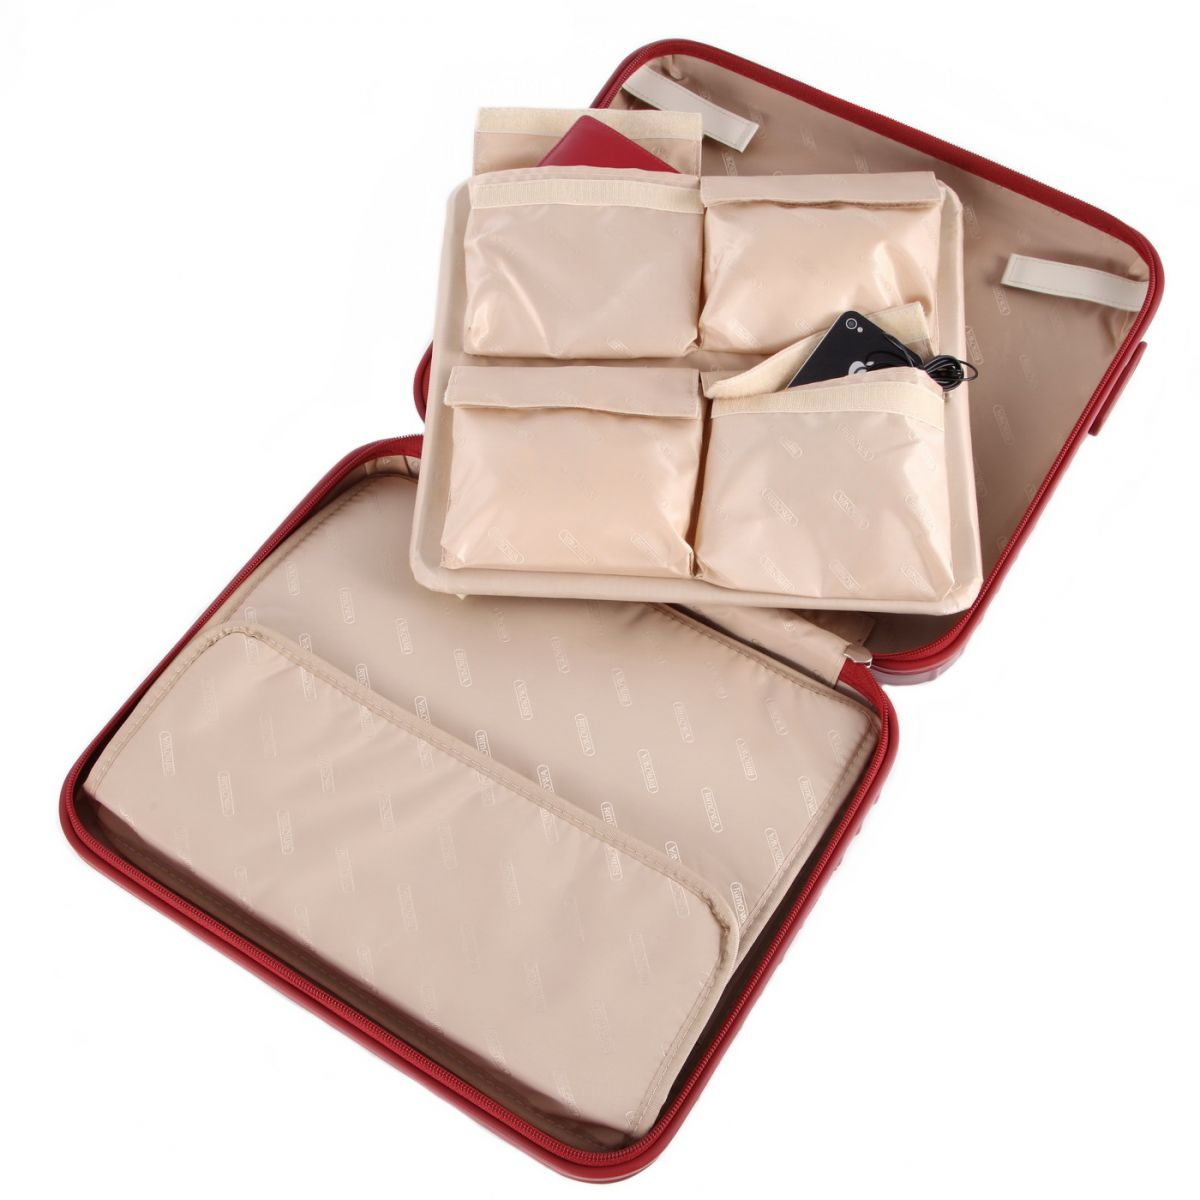 rimowa salsa deluxe hybrid notebook 3 ship2home. Black Bedroom Furniture Sets. Home Design Ideas